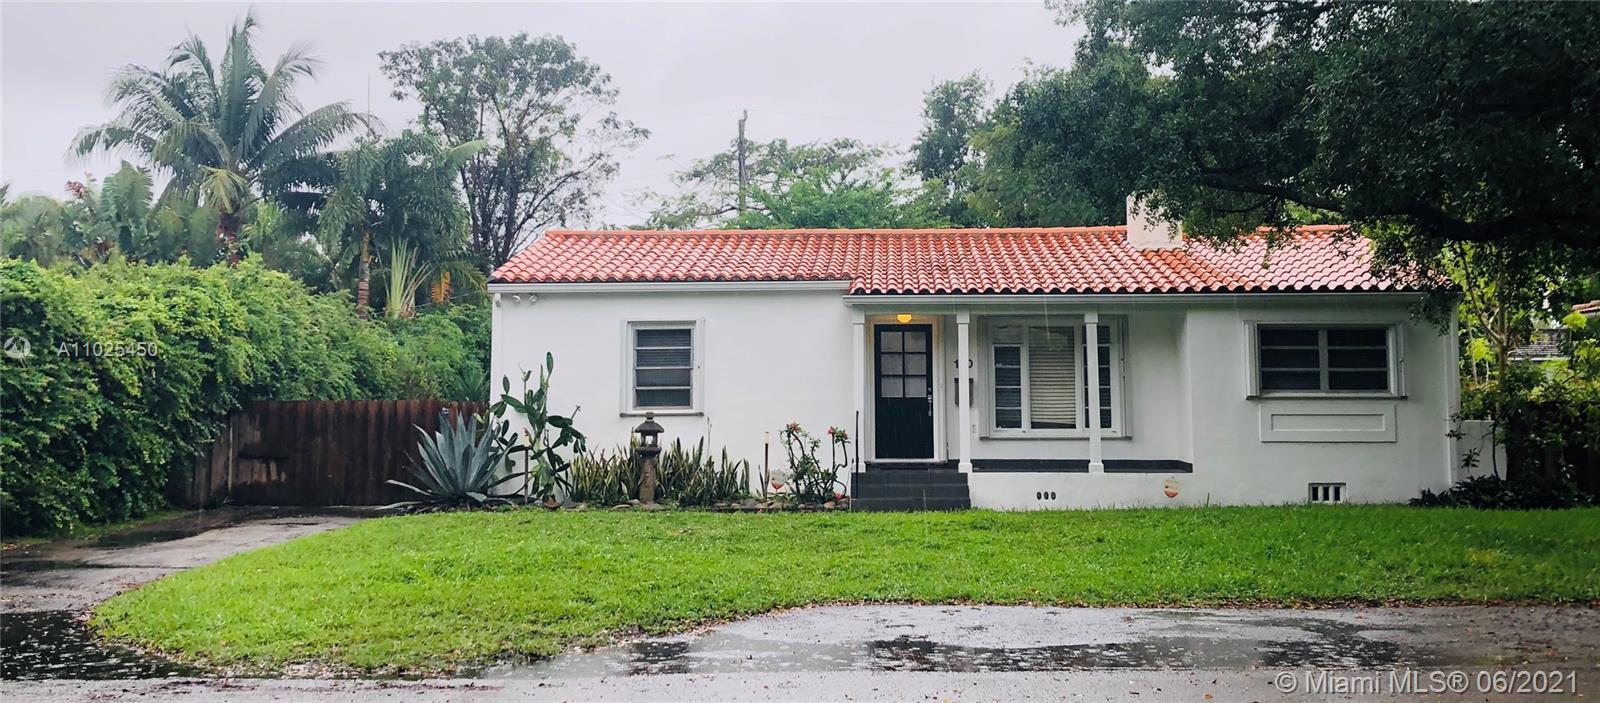 Miami Shores - 160 NW 101st St, Miami Shores, FL 33150